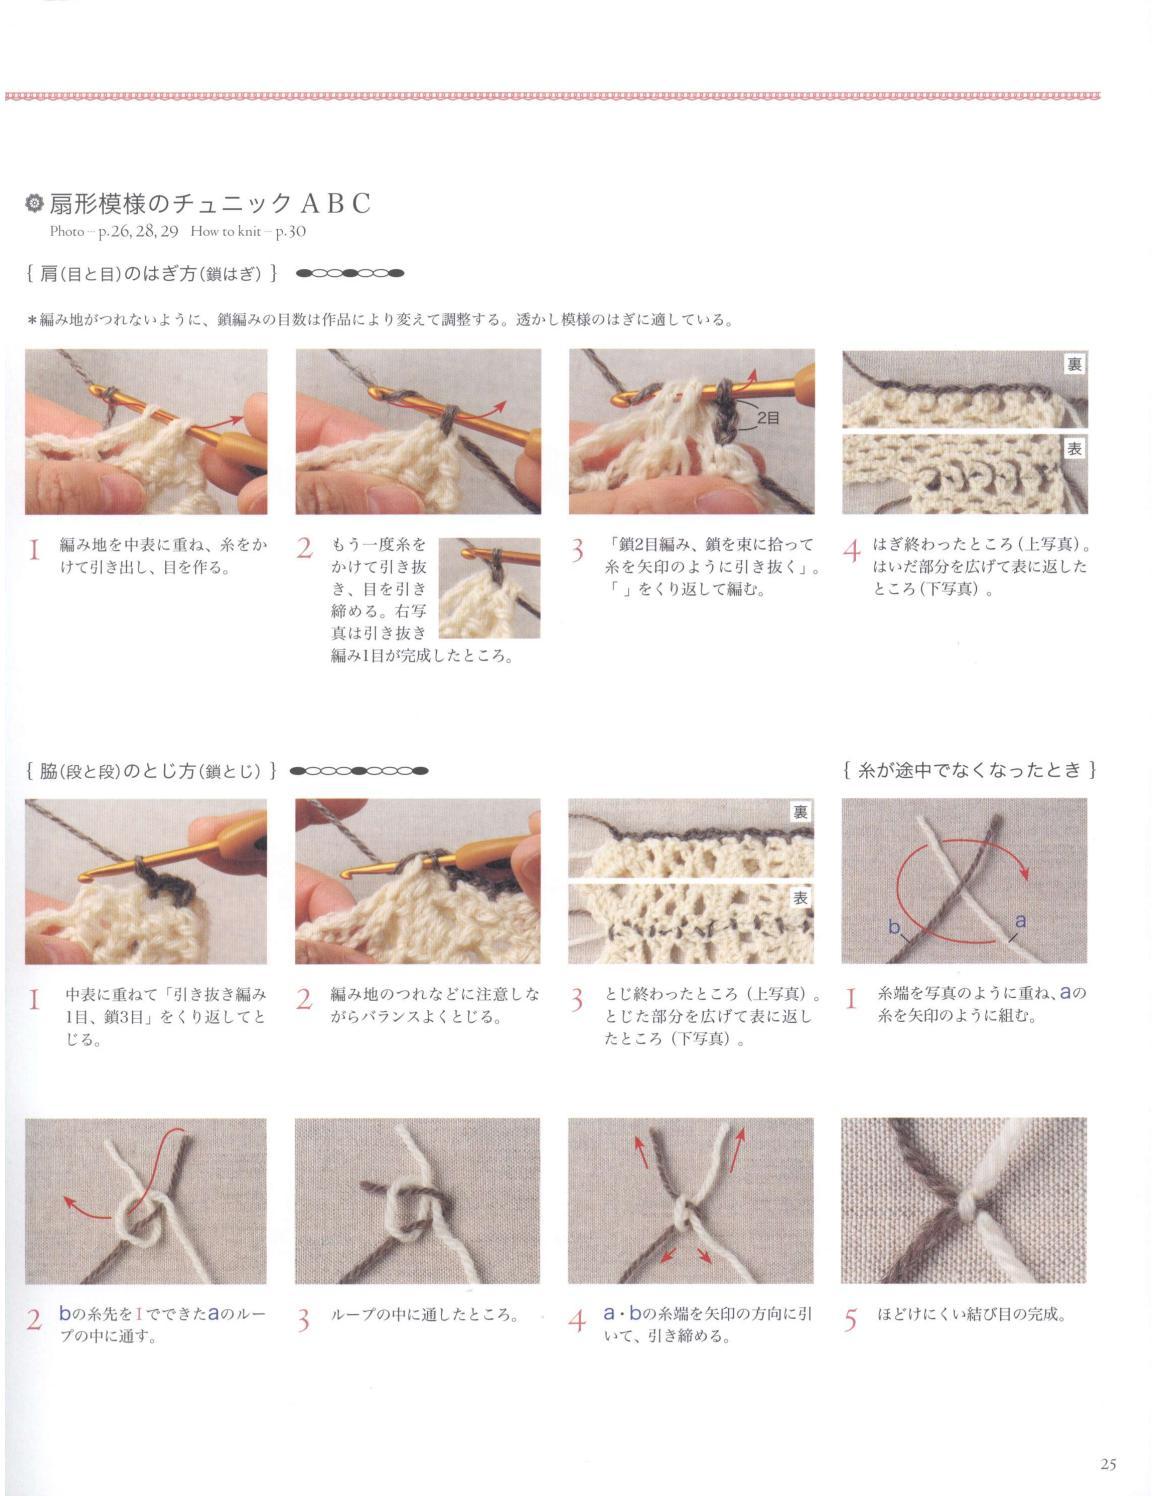 Asahi original crochet best selection 2012 page 25